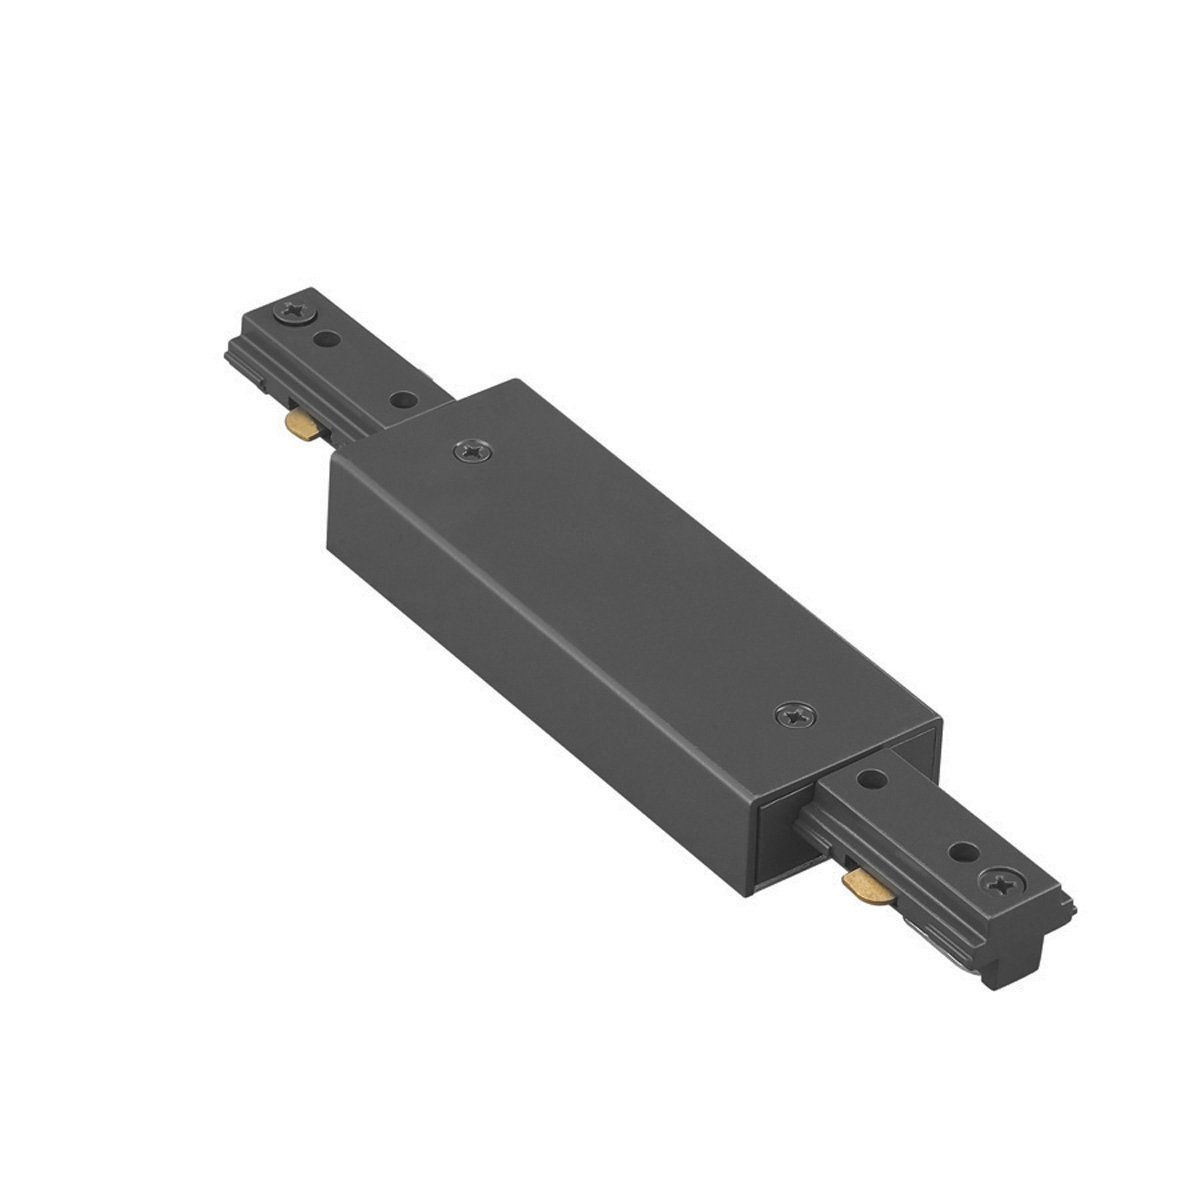 WAC Lighting JI-PWR-BK J Track Power Feedable I Connector, Black